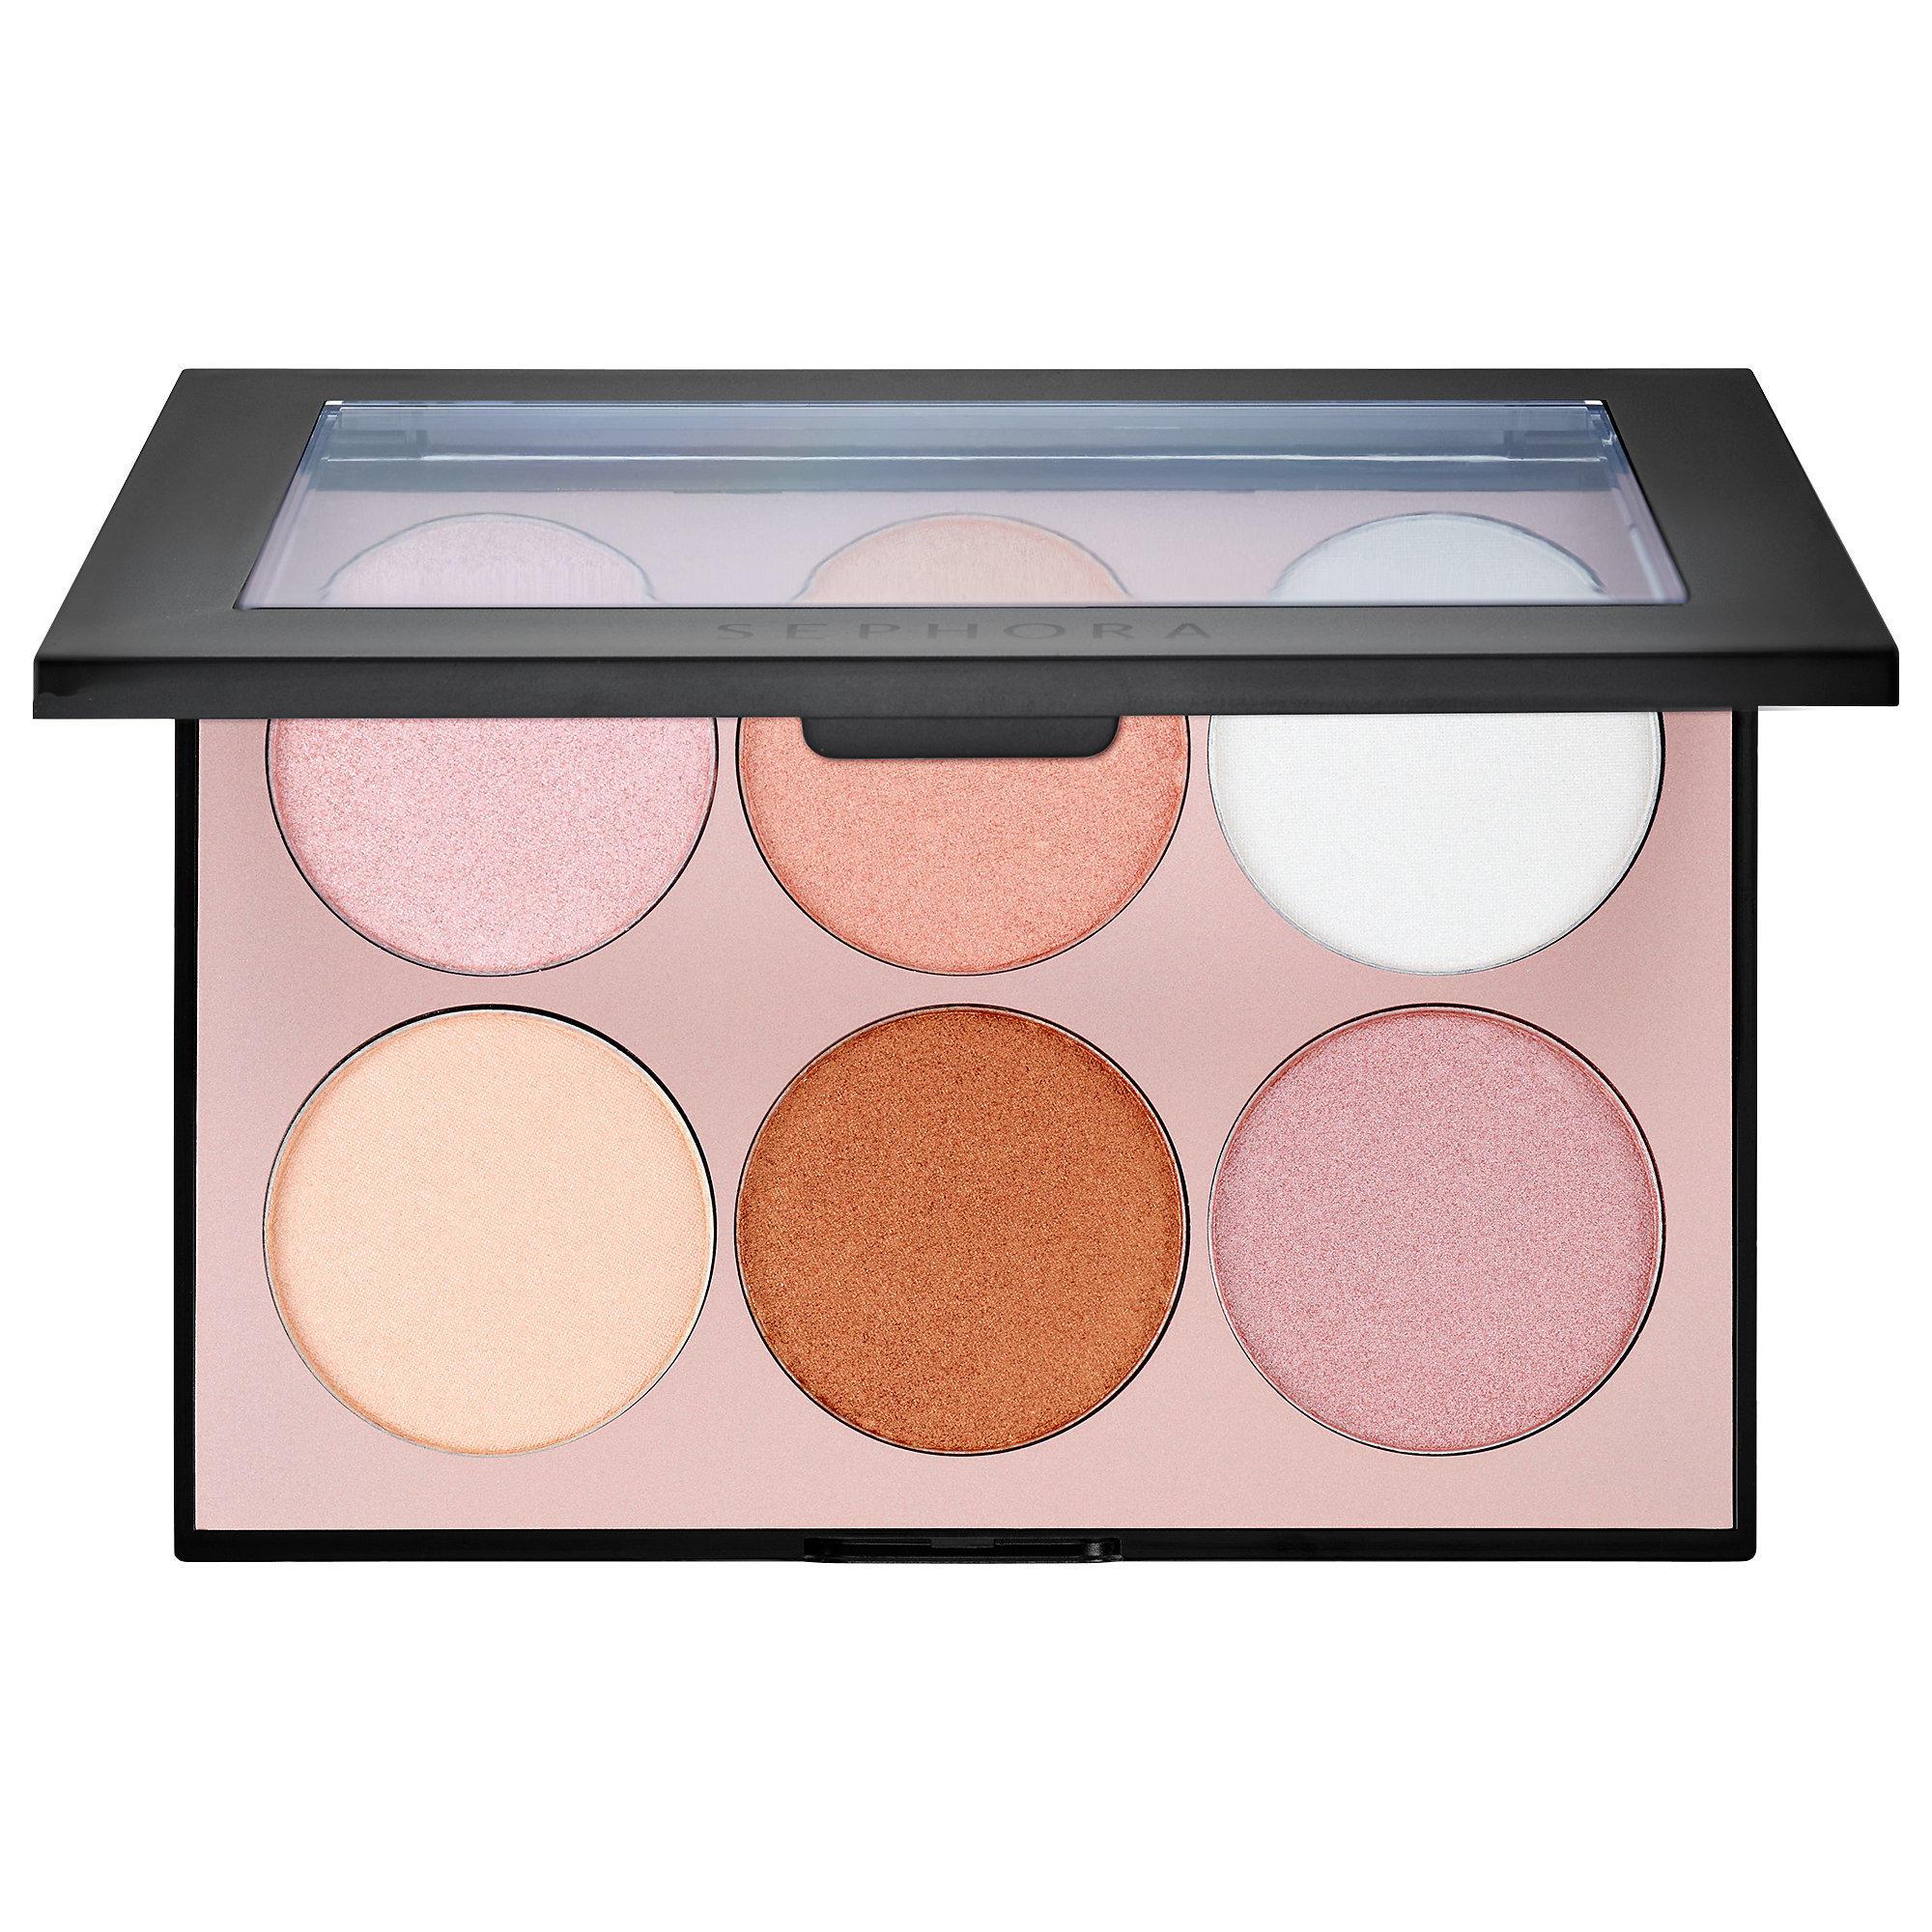 Sephora Illuminate Luminizing Palette